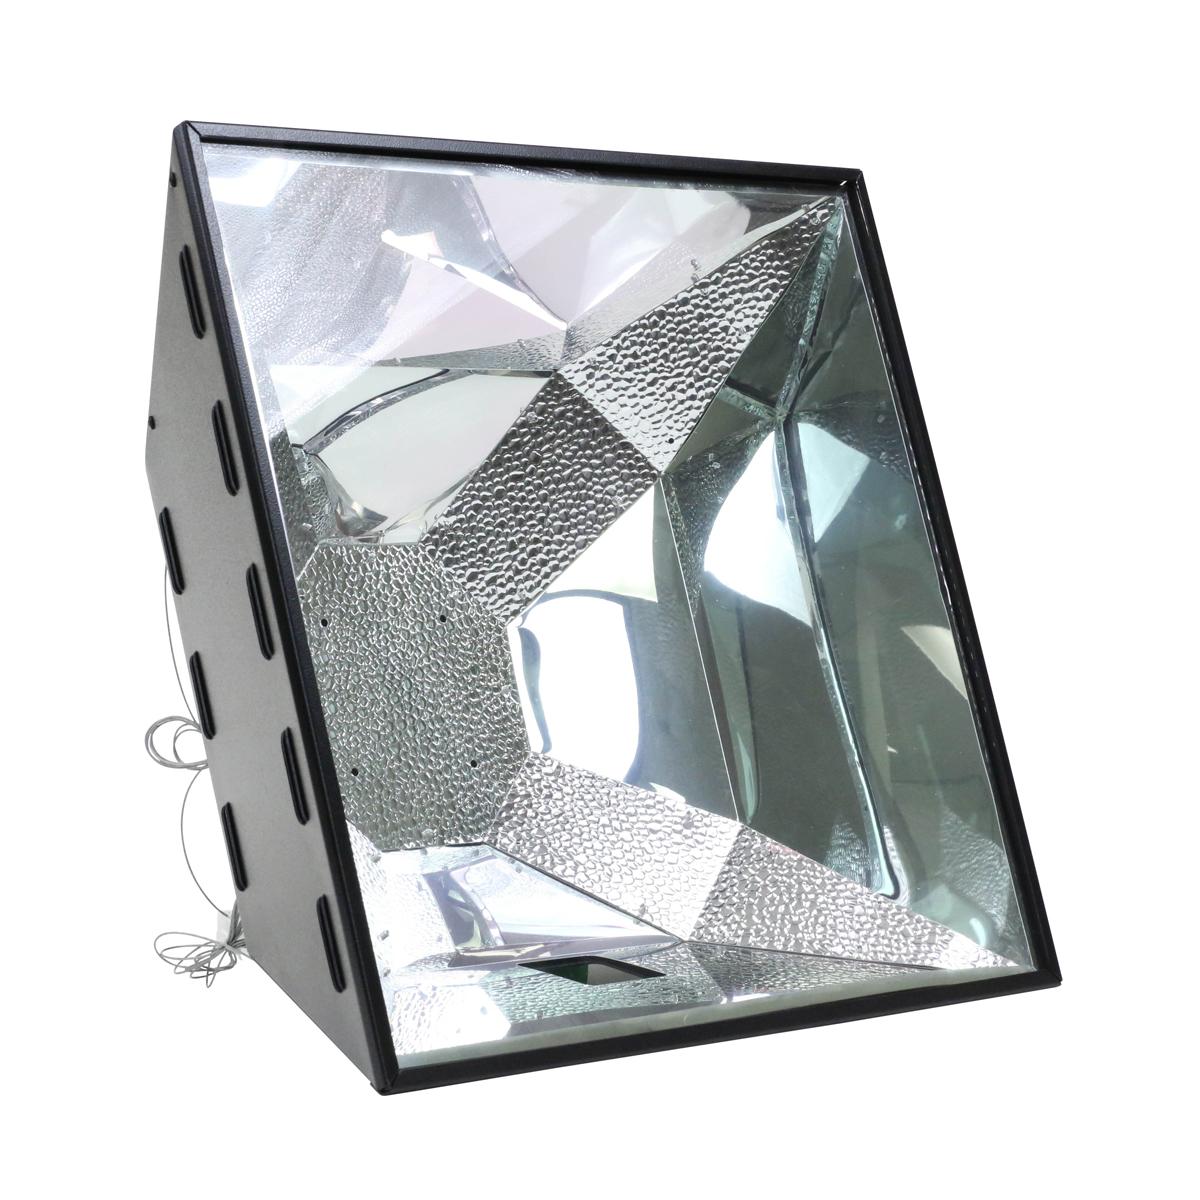 Hamilton Technology Bimini Sun 250w Metal Halide System: Cozumel Sun Single Ended Metal Halide Reflector